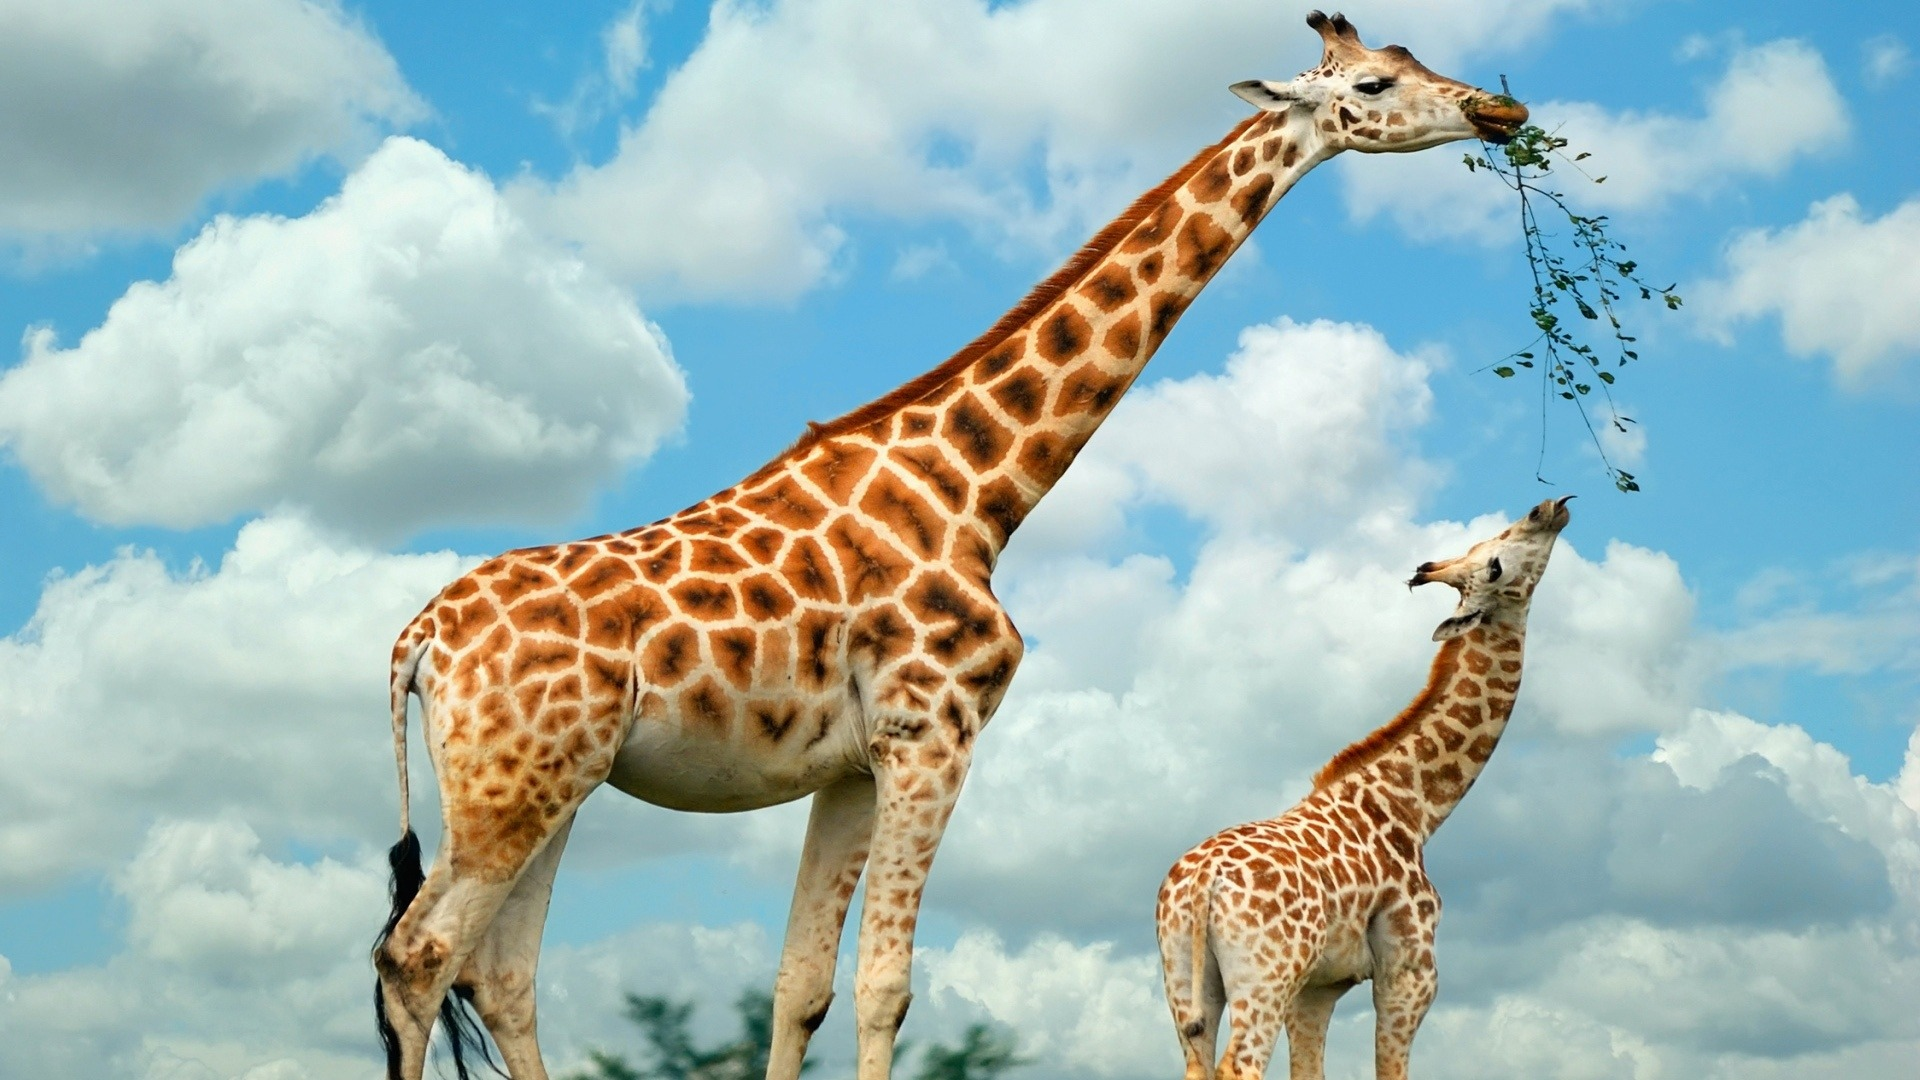 giraffe images wild